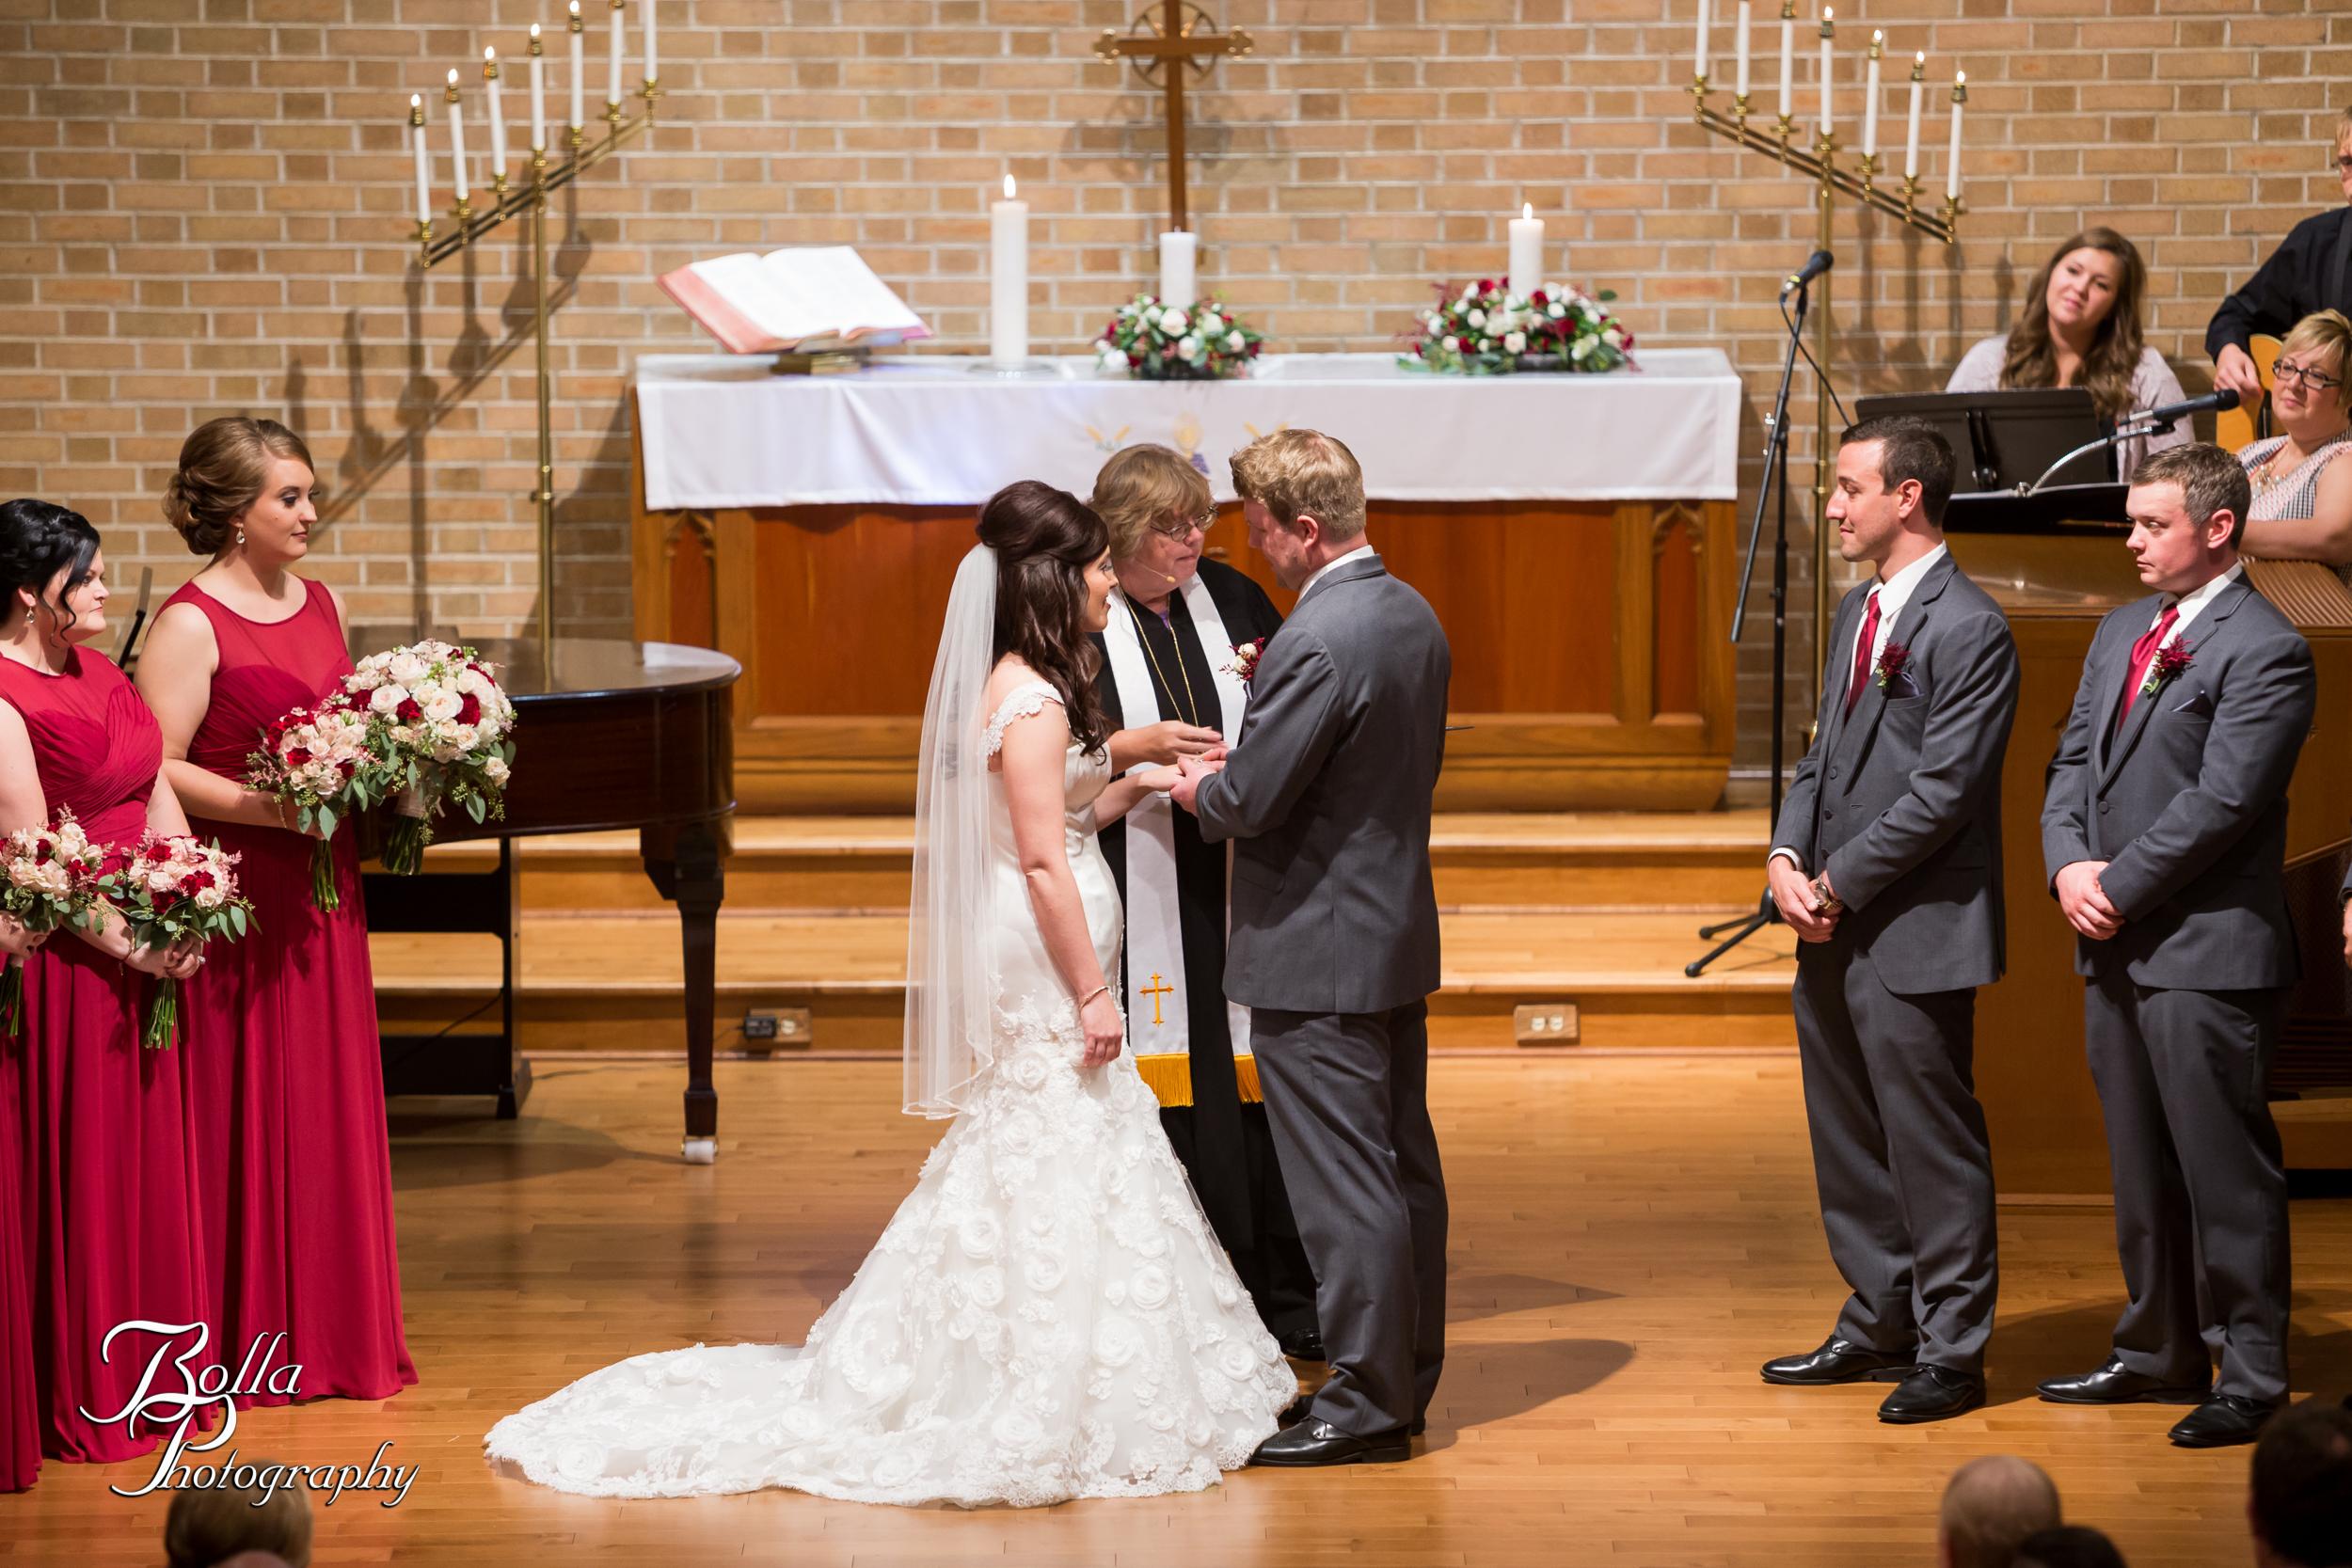 Bolla_photography_edwardsville_wedding_photographer_st_louis_weddings_Reilmann-0163.jpg